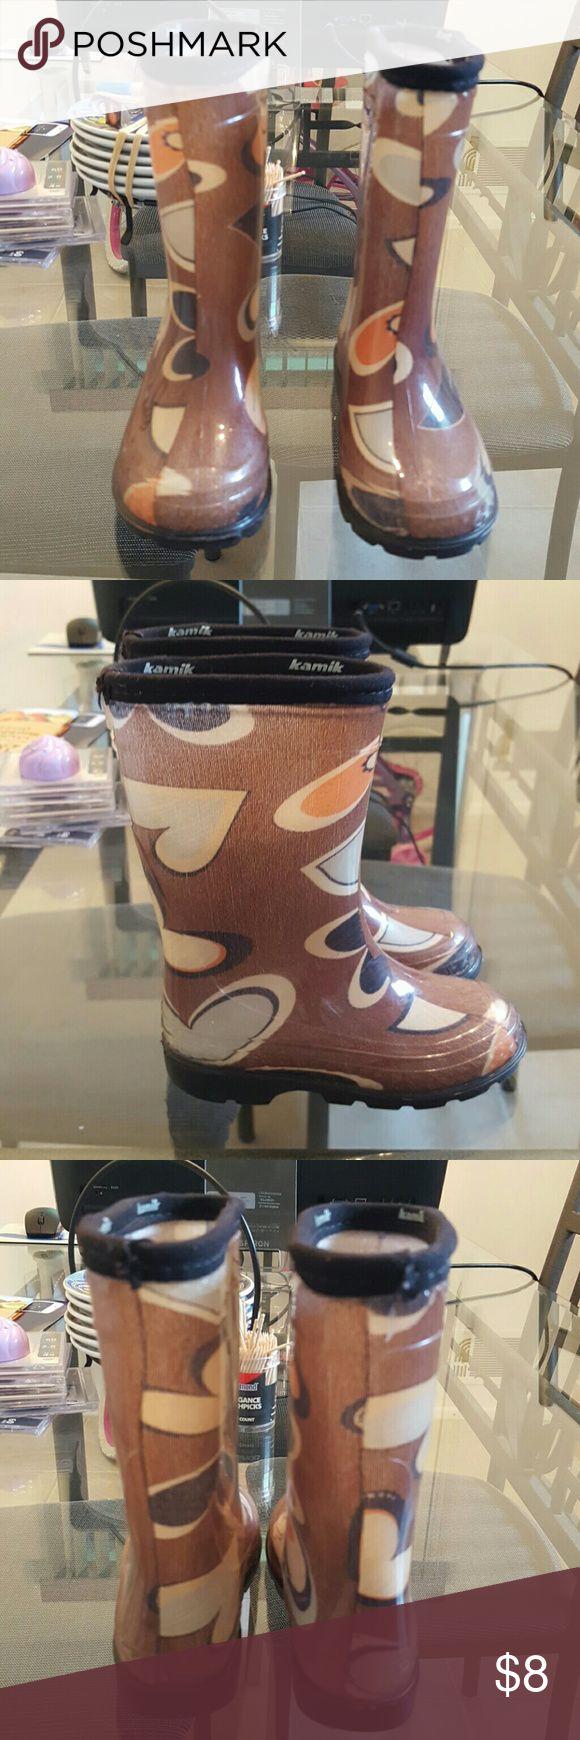 Toddler Rain Boots EUC Tannish Bown w/colorful heart shapes Kamik Shoes Rain & Snow Boots